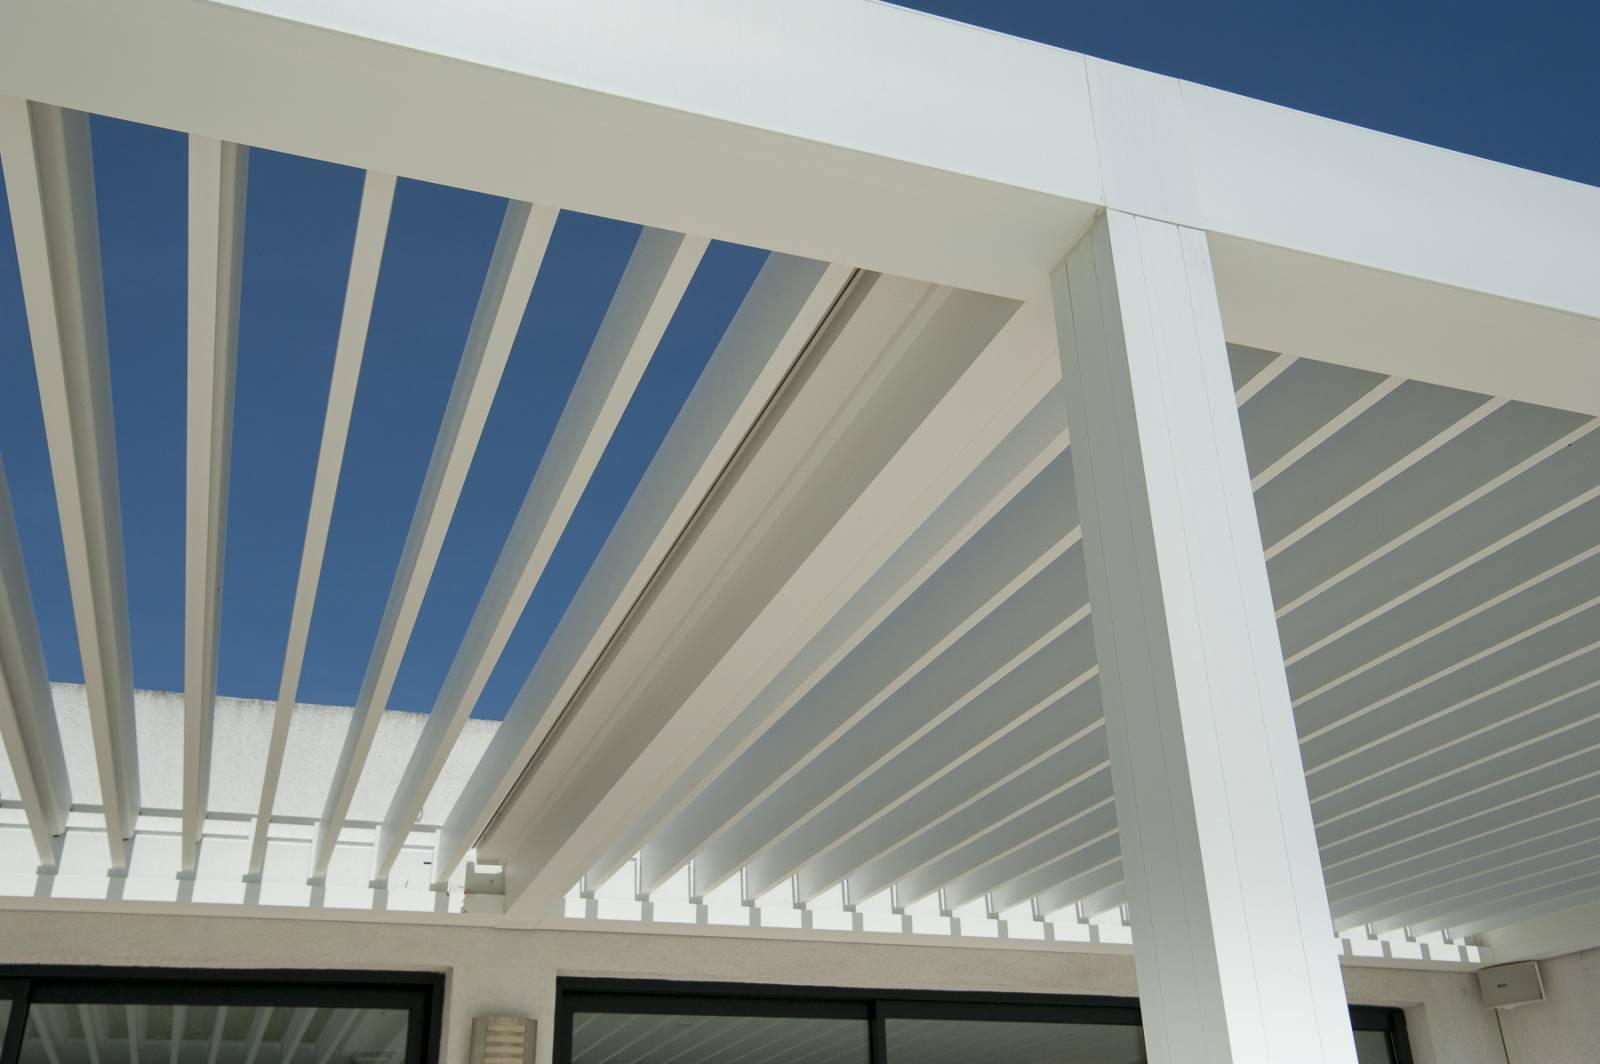 Alu Design Vaison La Romaine rÉalisation pergola bioclimatique aluminium camargue salon